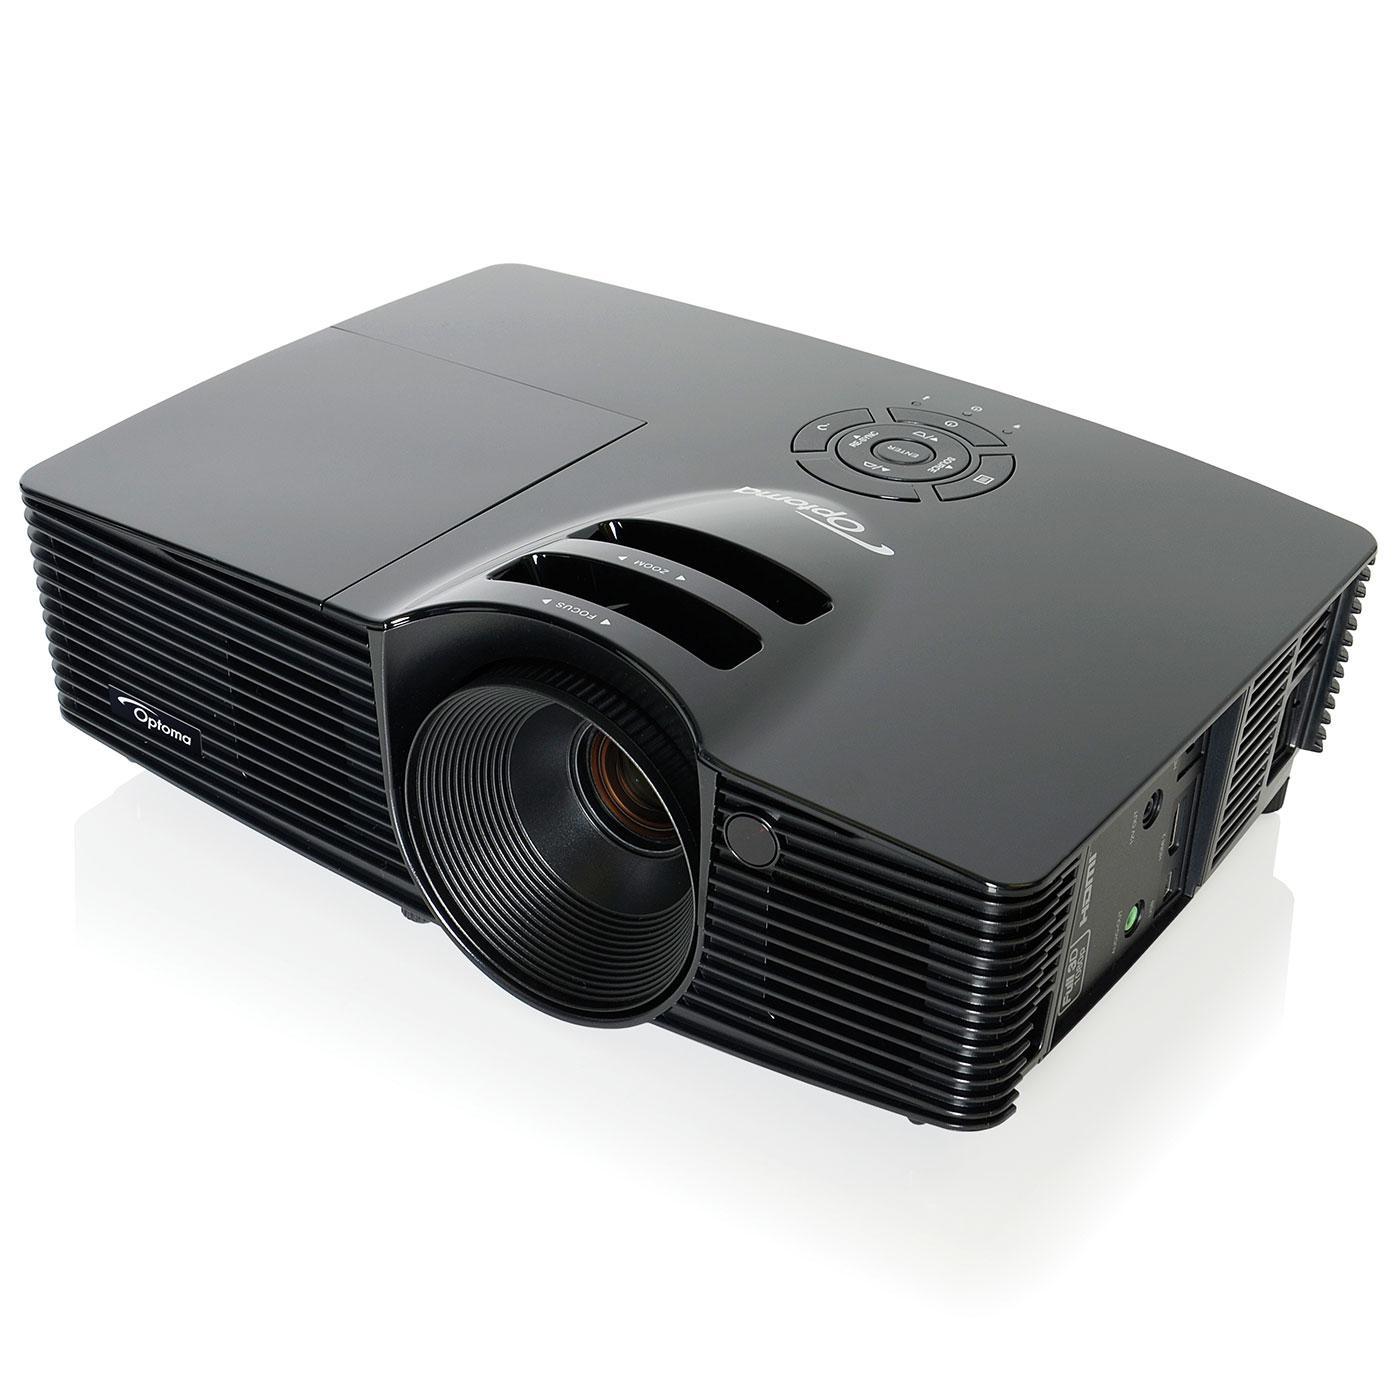 Vidéoprojecteur Optoma HD139X - Full HD 1080p, Full 3D, 3000 Lumens